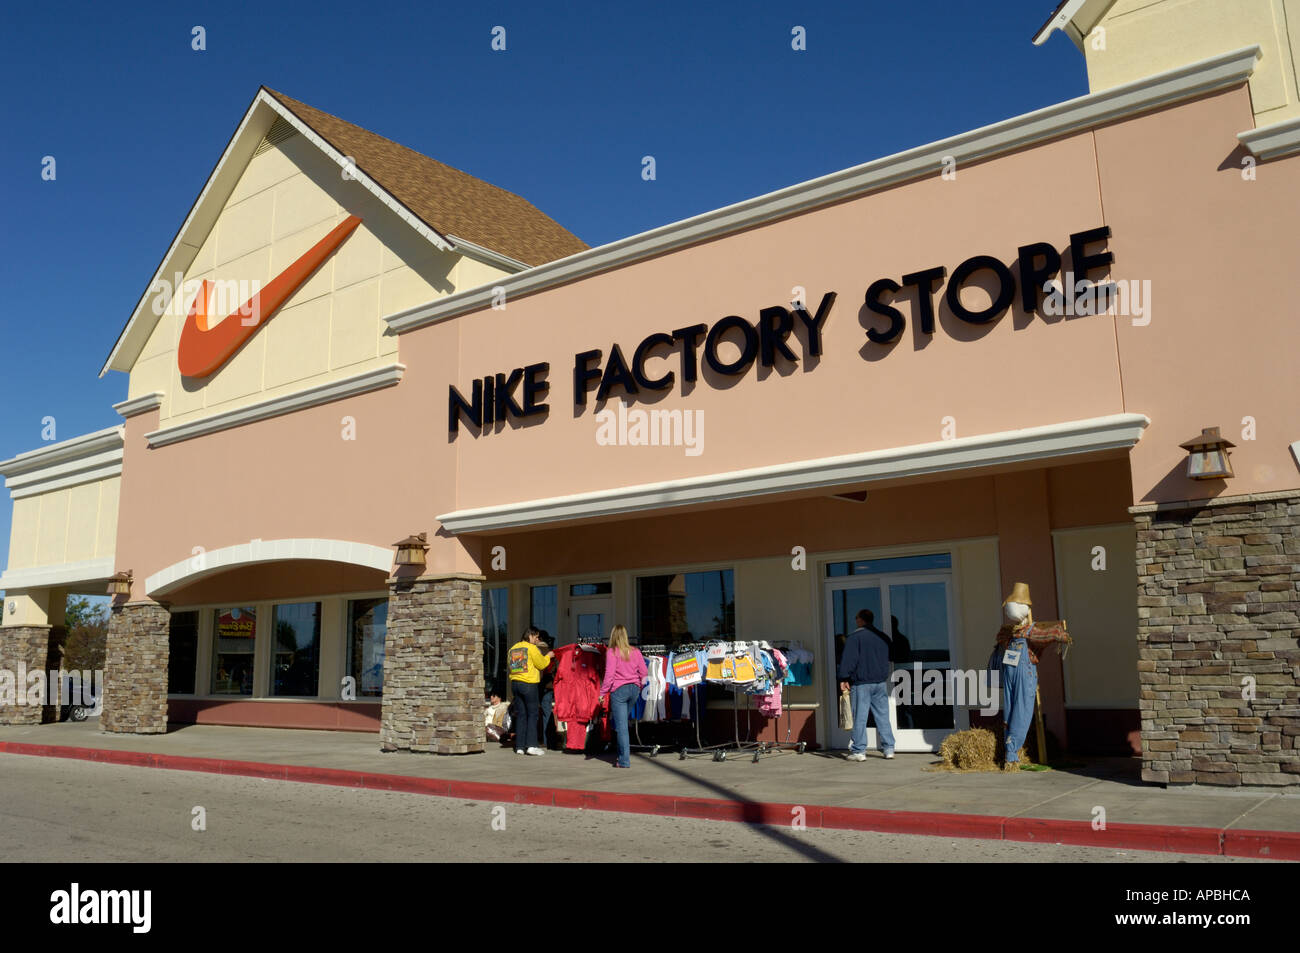 Fotos Nike Imágenes Alamy Stockamp; De Factory uPkiZX